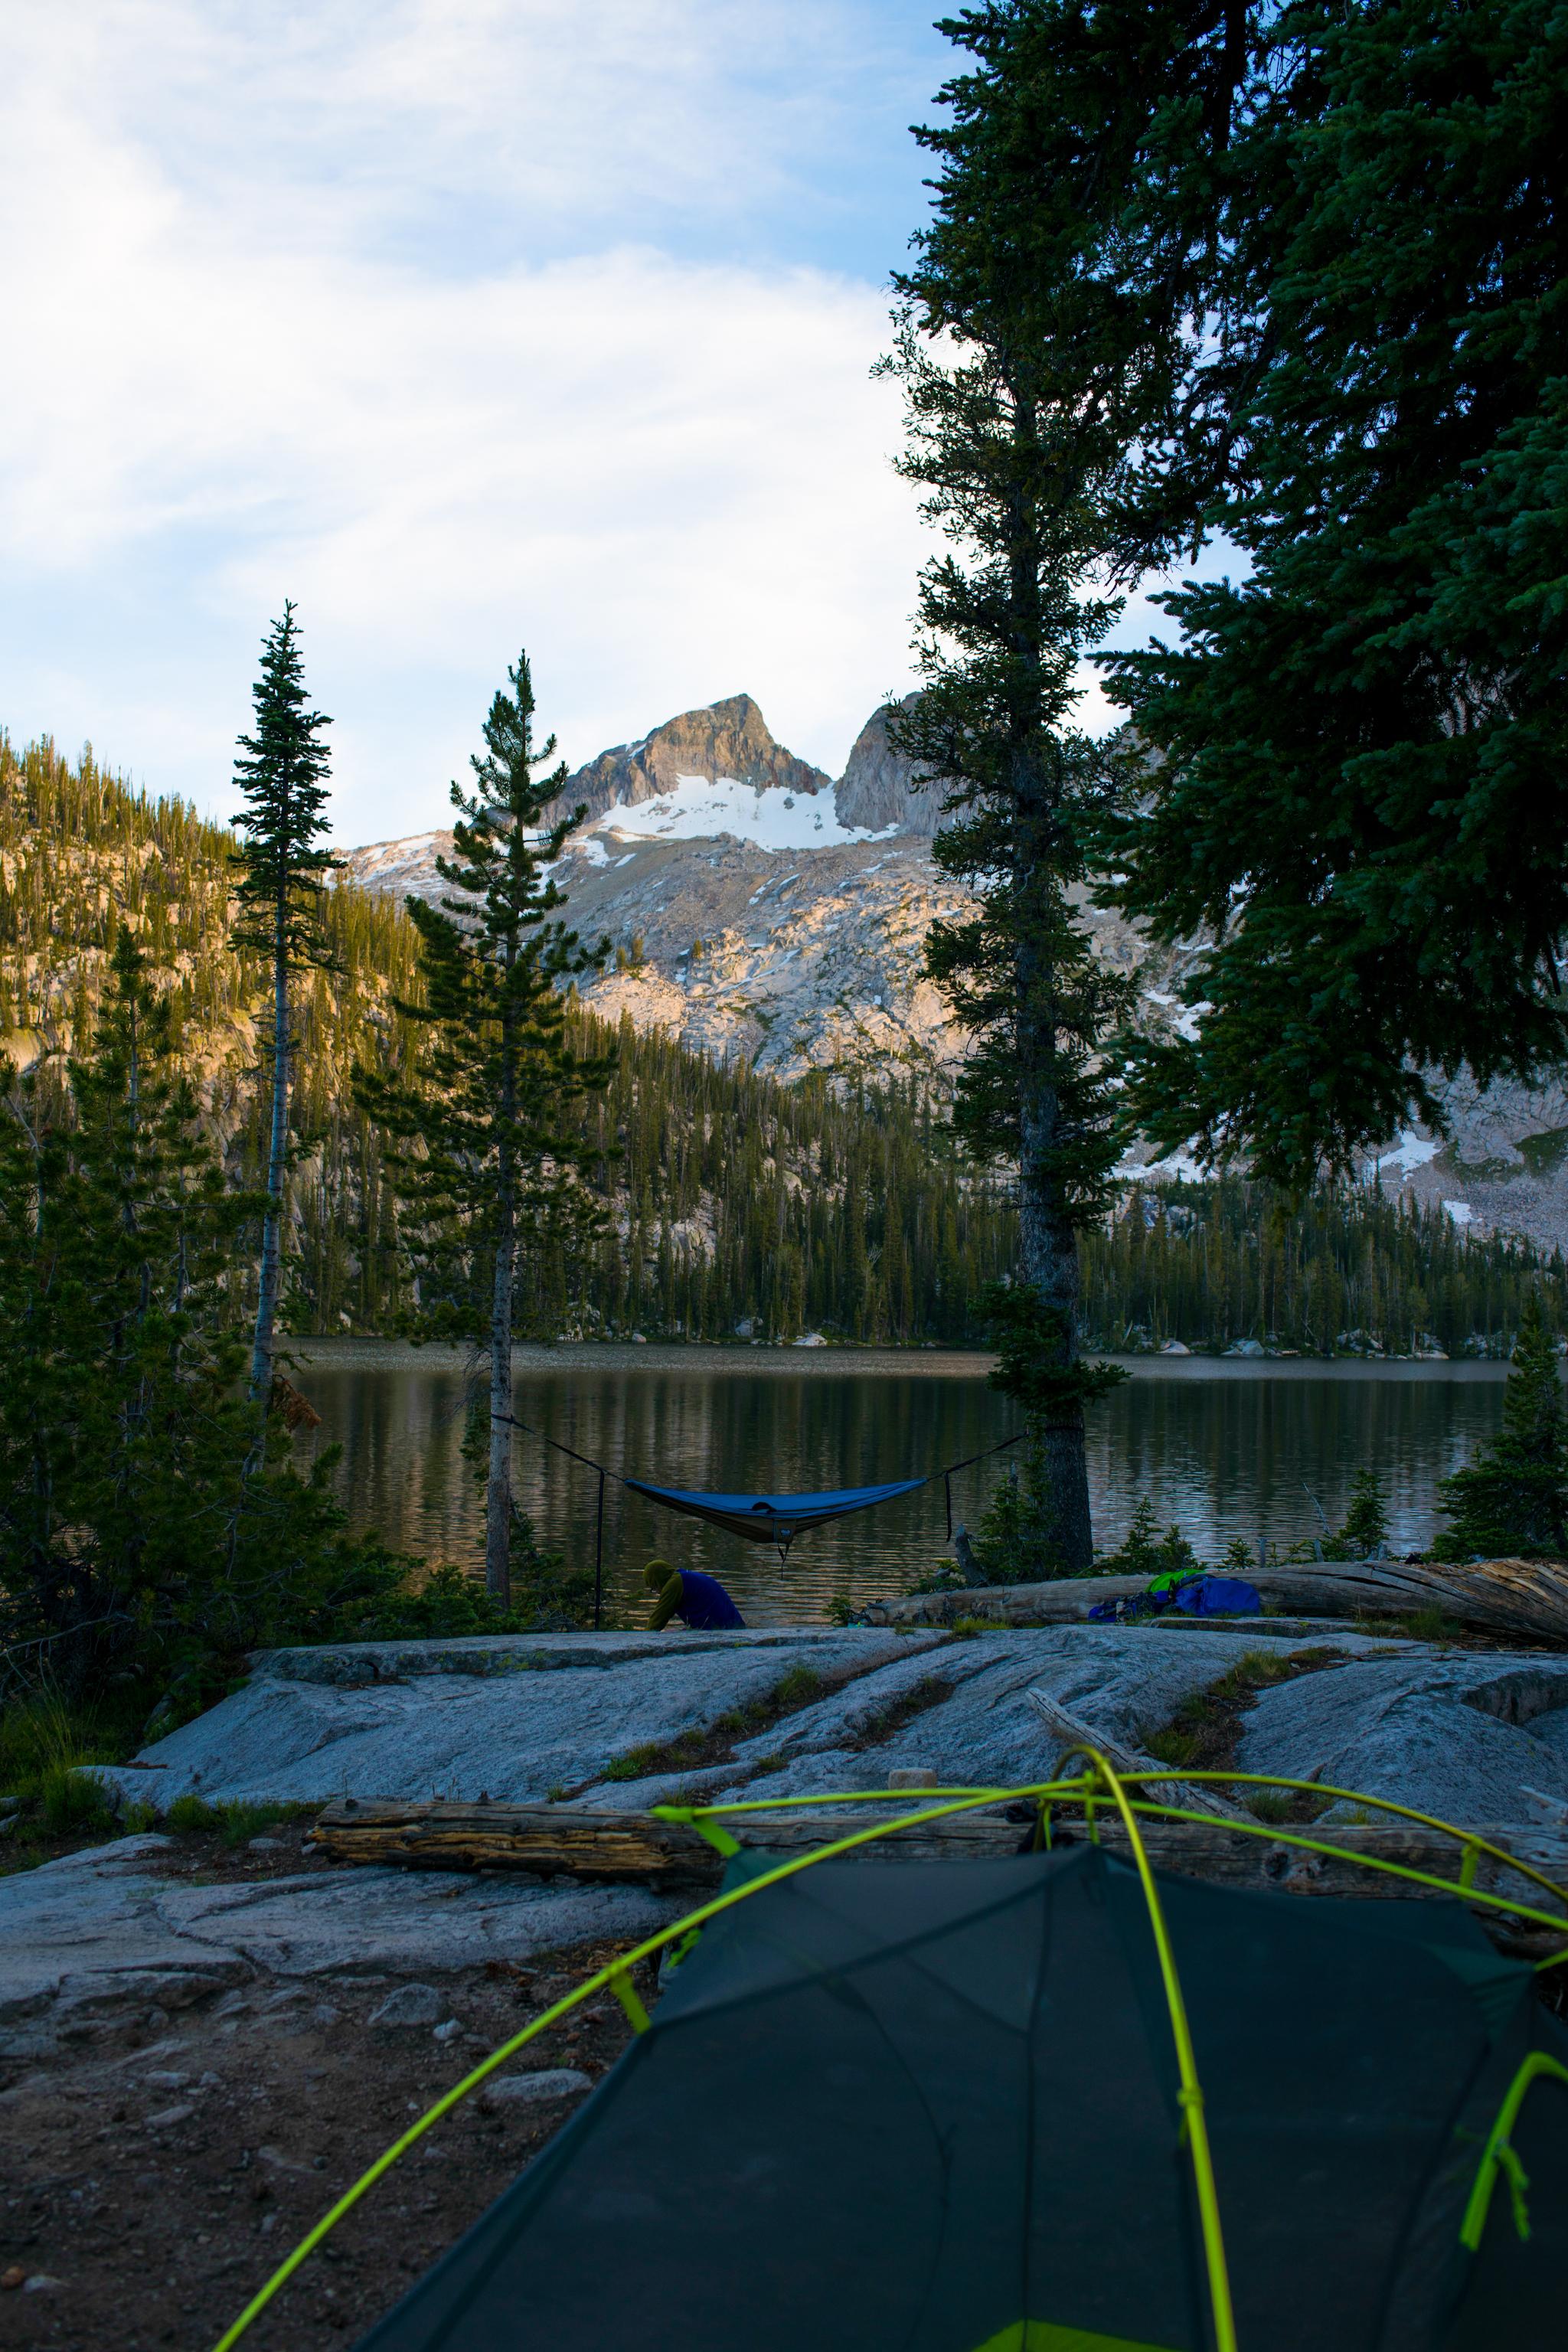 Our dreamy campsite